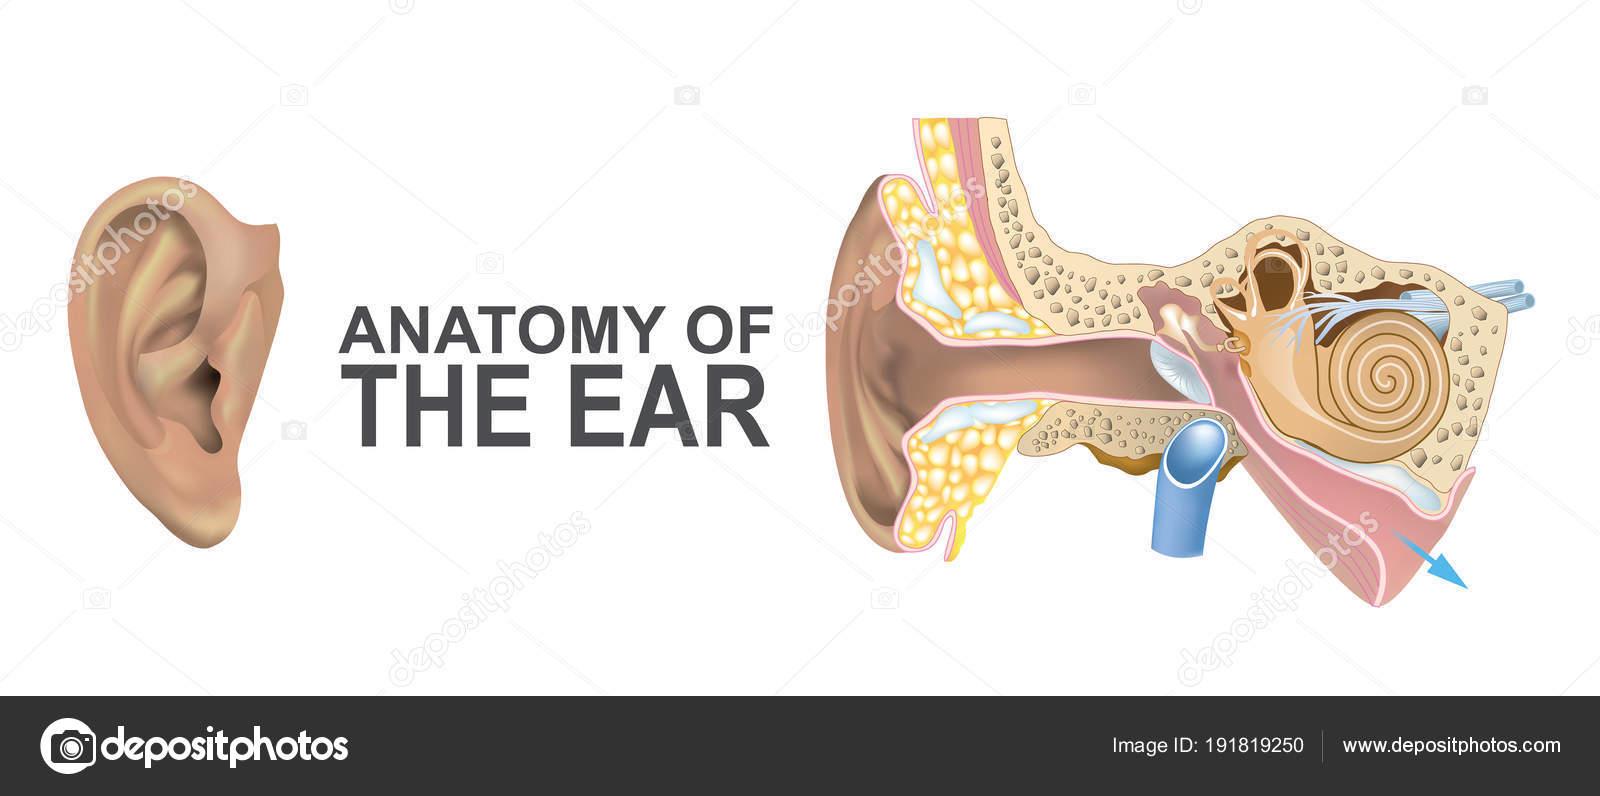 Anatomie des Ohres — Stockvektor © pattarawit #191819250